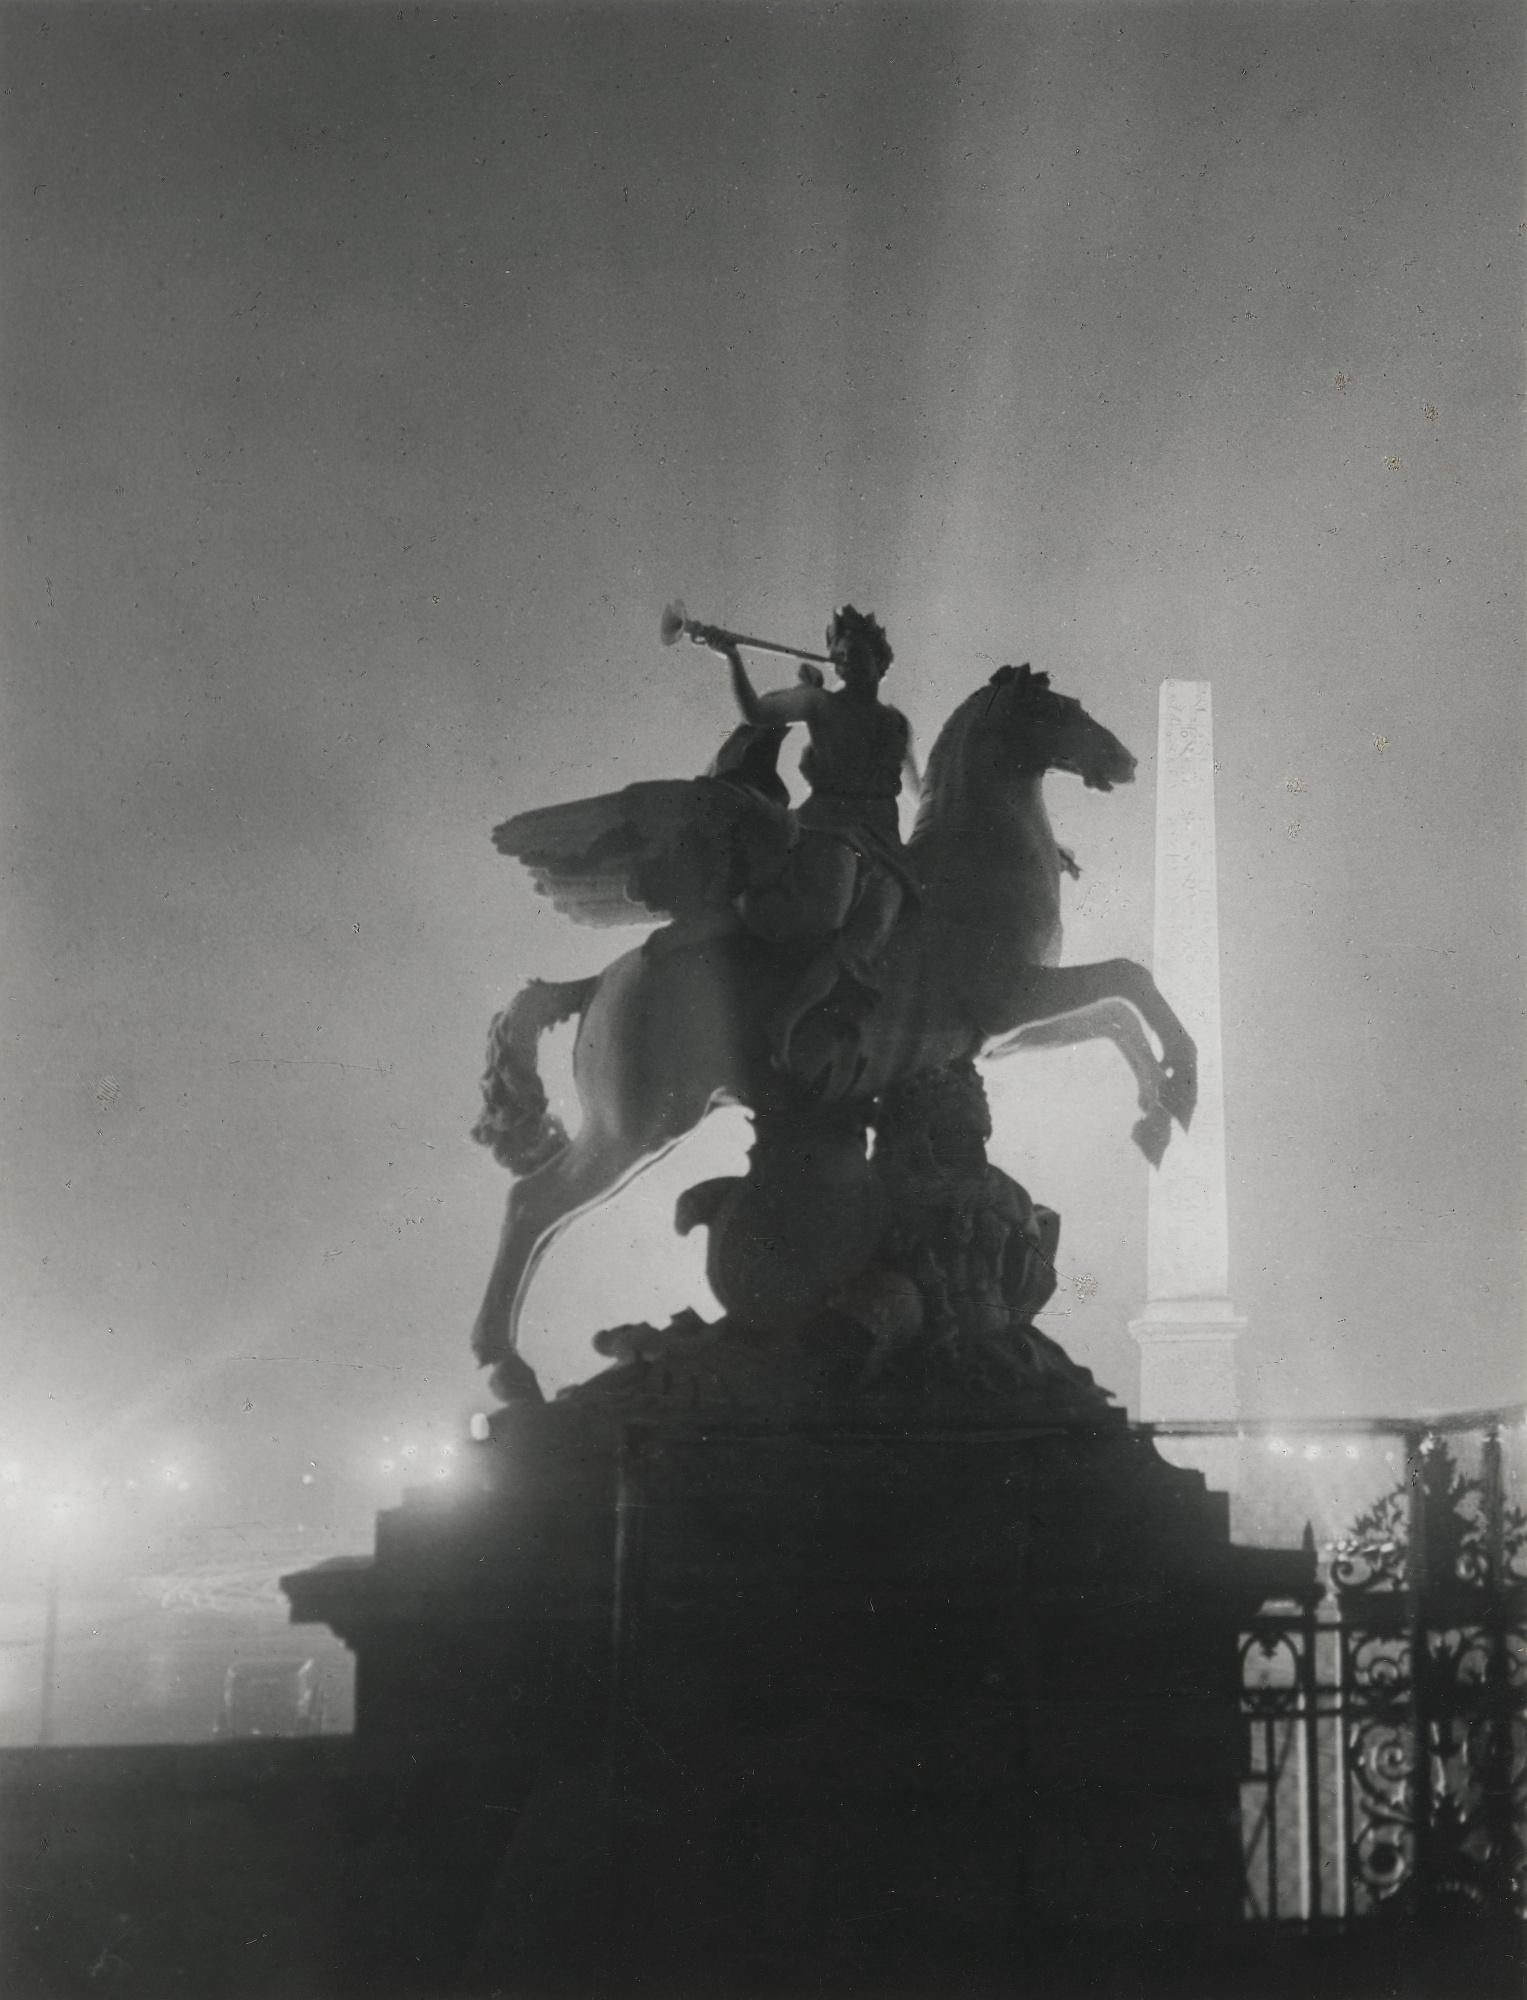 Brassai-Place De La Concorde Vers-1932